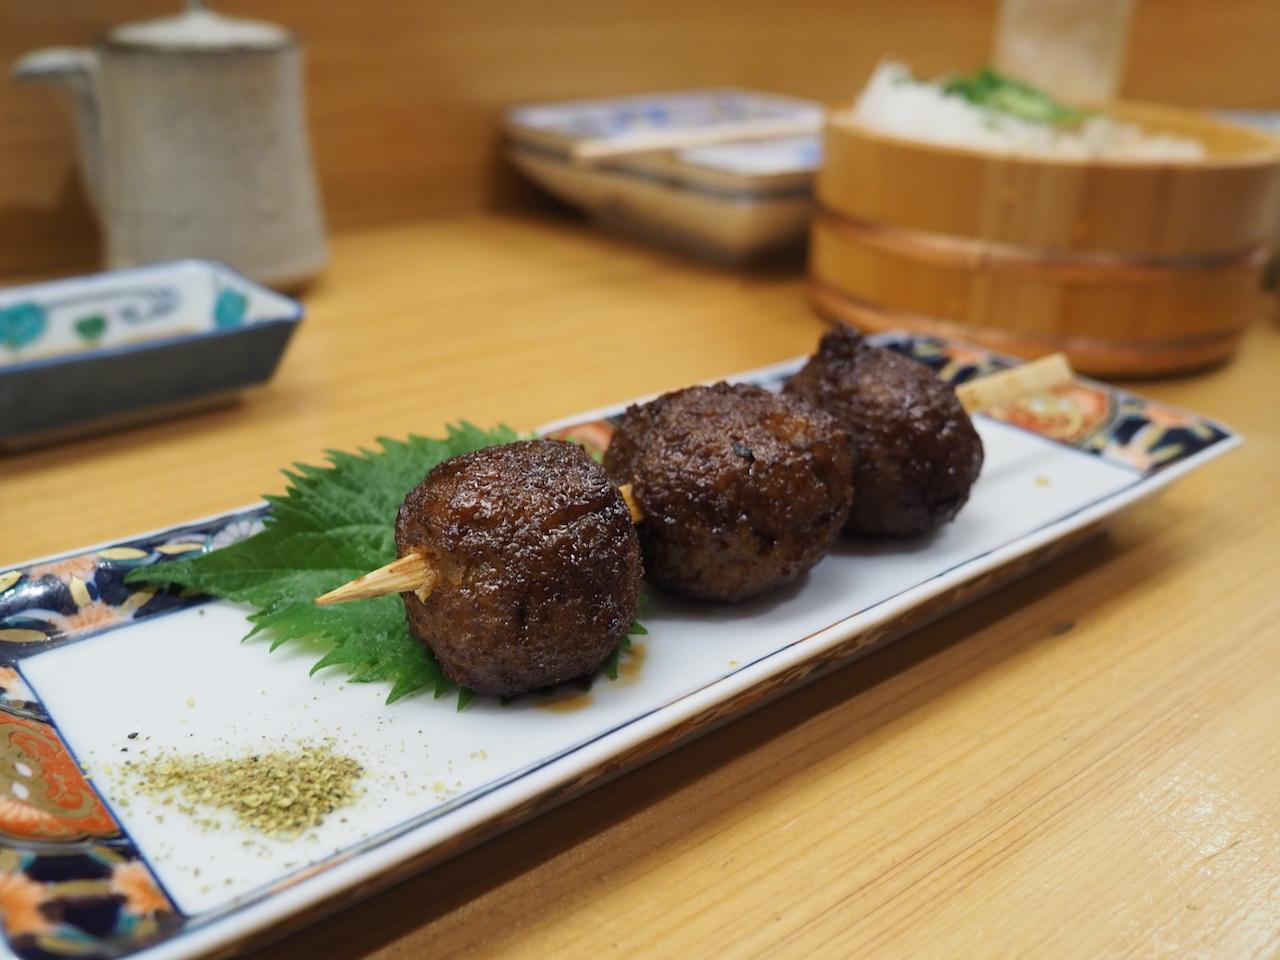 Nodokuro_2104-107.jpeg